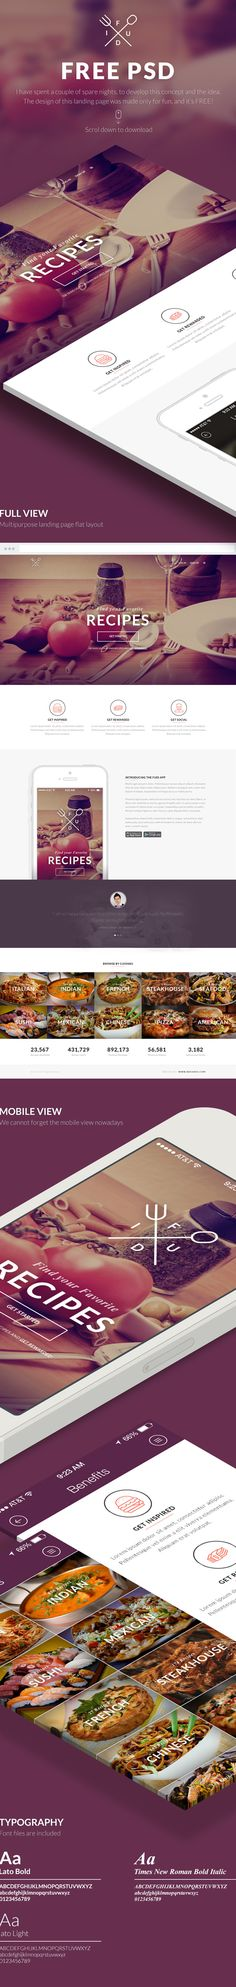 FREE PSD Multipurpose Landing Page! - Landing Page - Ideas of Landing Page - Kristijan Binski via Behance Website Design Inspiration, Landing Page Inspiration, Intelligent Design, Web Layout, Layout Design, Tool Design, Page Design, Pag Web, Photoshop